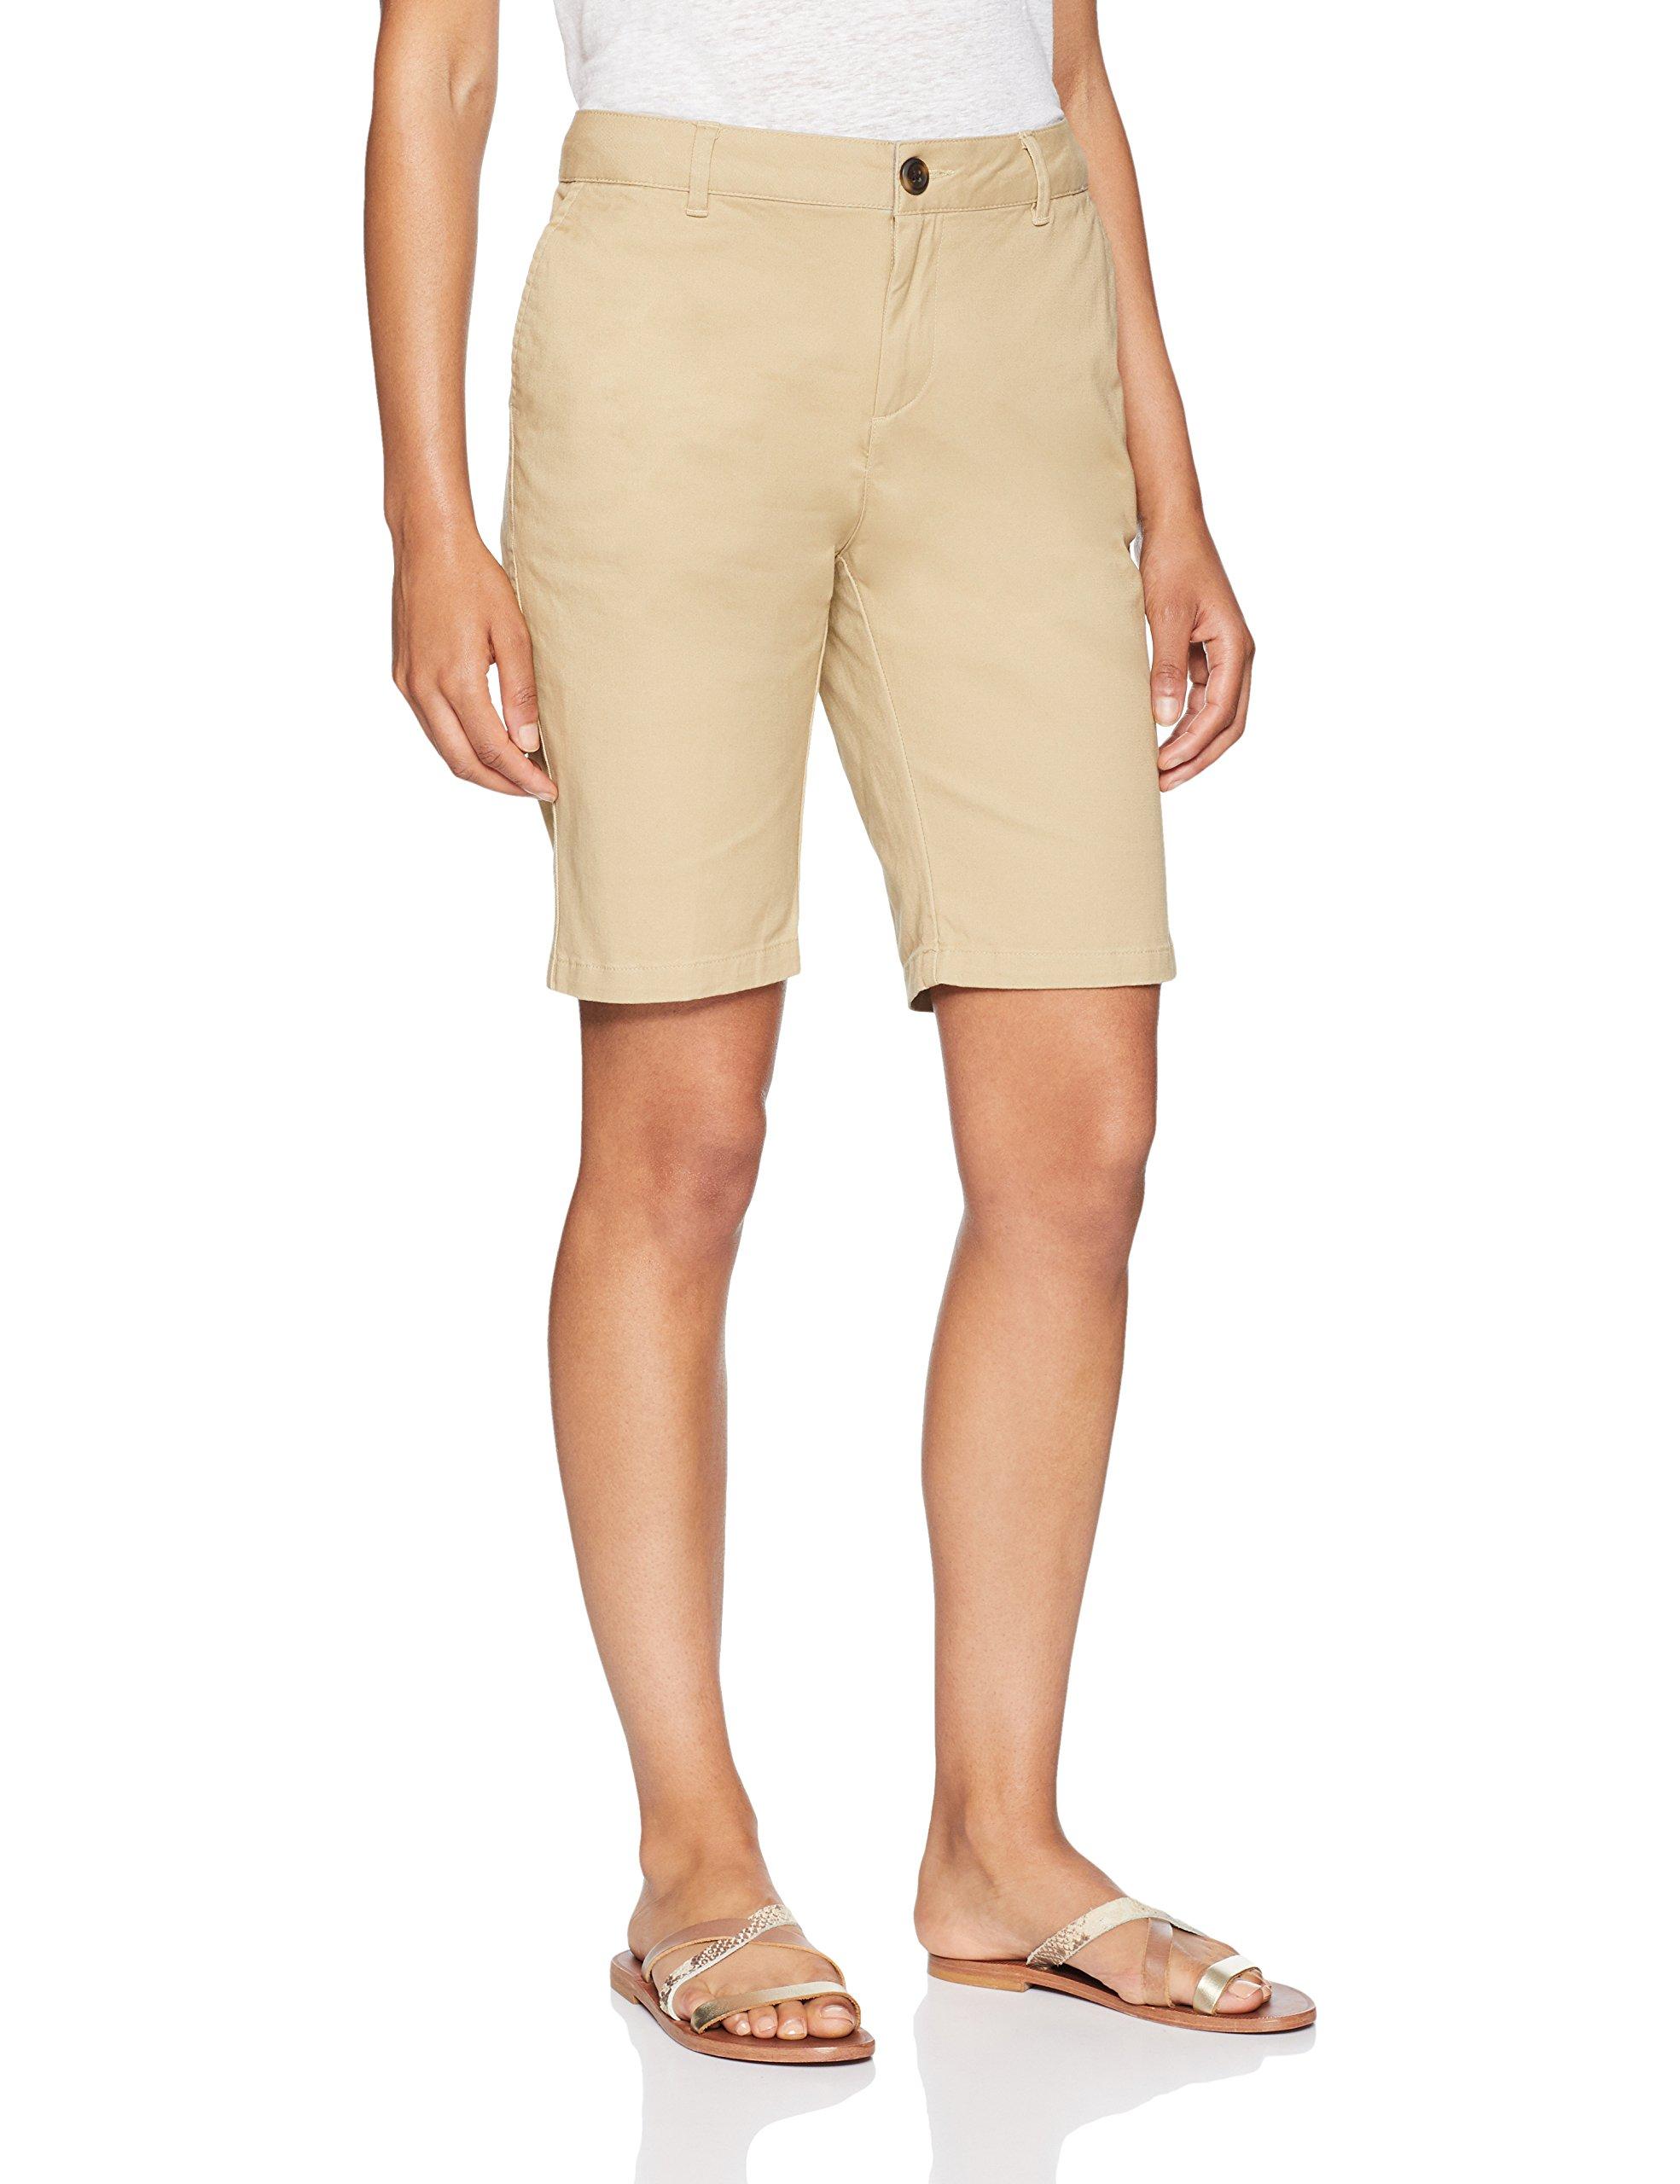 Amazon Essentials Women's 10'' Inseam Solid Bermuda Short Shorts, Khaki, 4